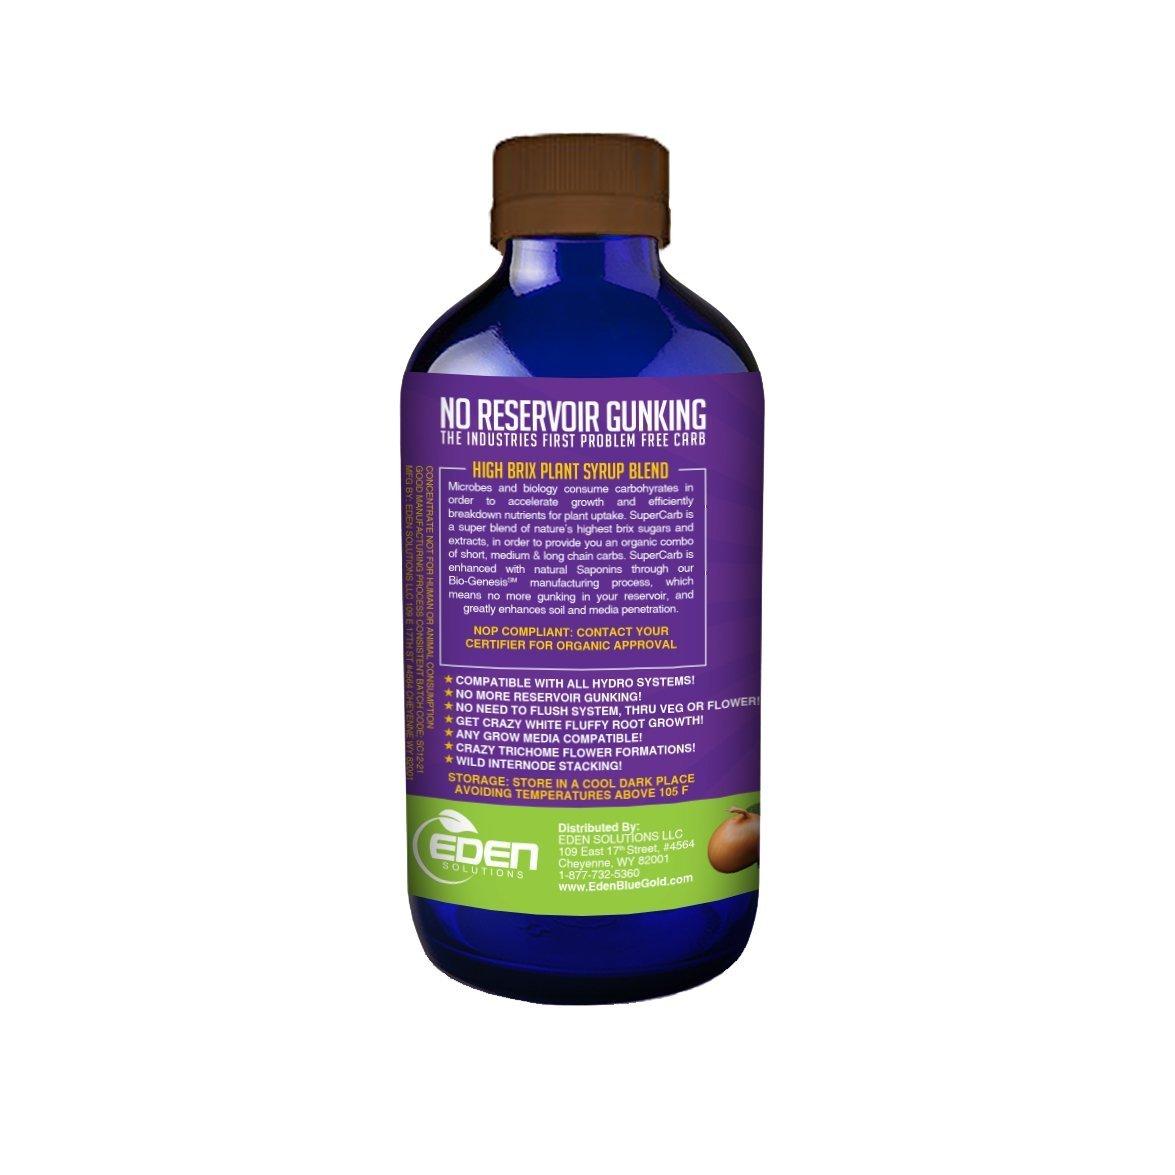 Blue Gold Super Carb, Organic Plant Syrup Enhanced Molasses, Concentrate 8  fl  oz  Bottle